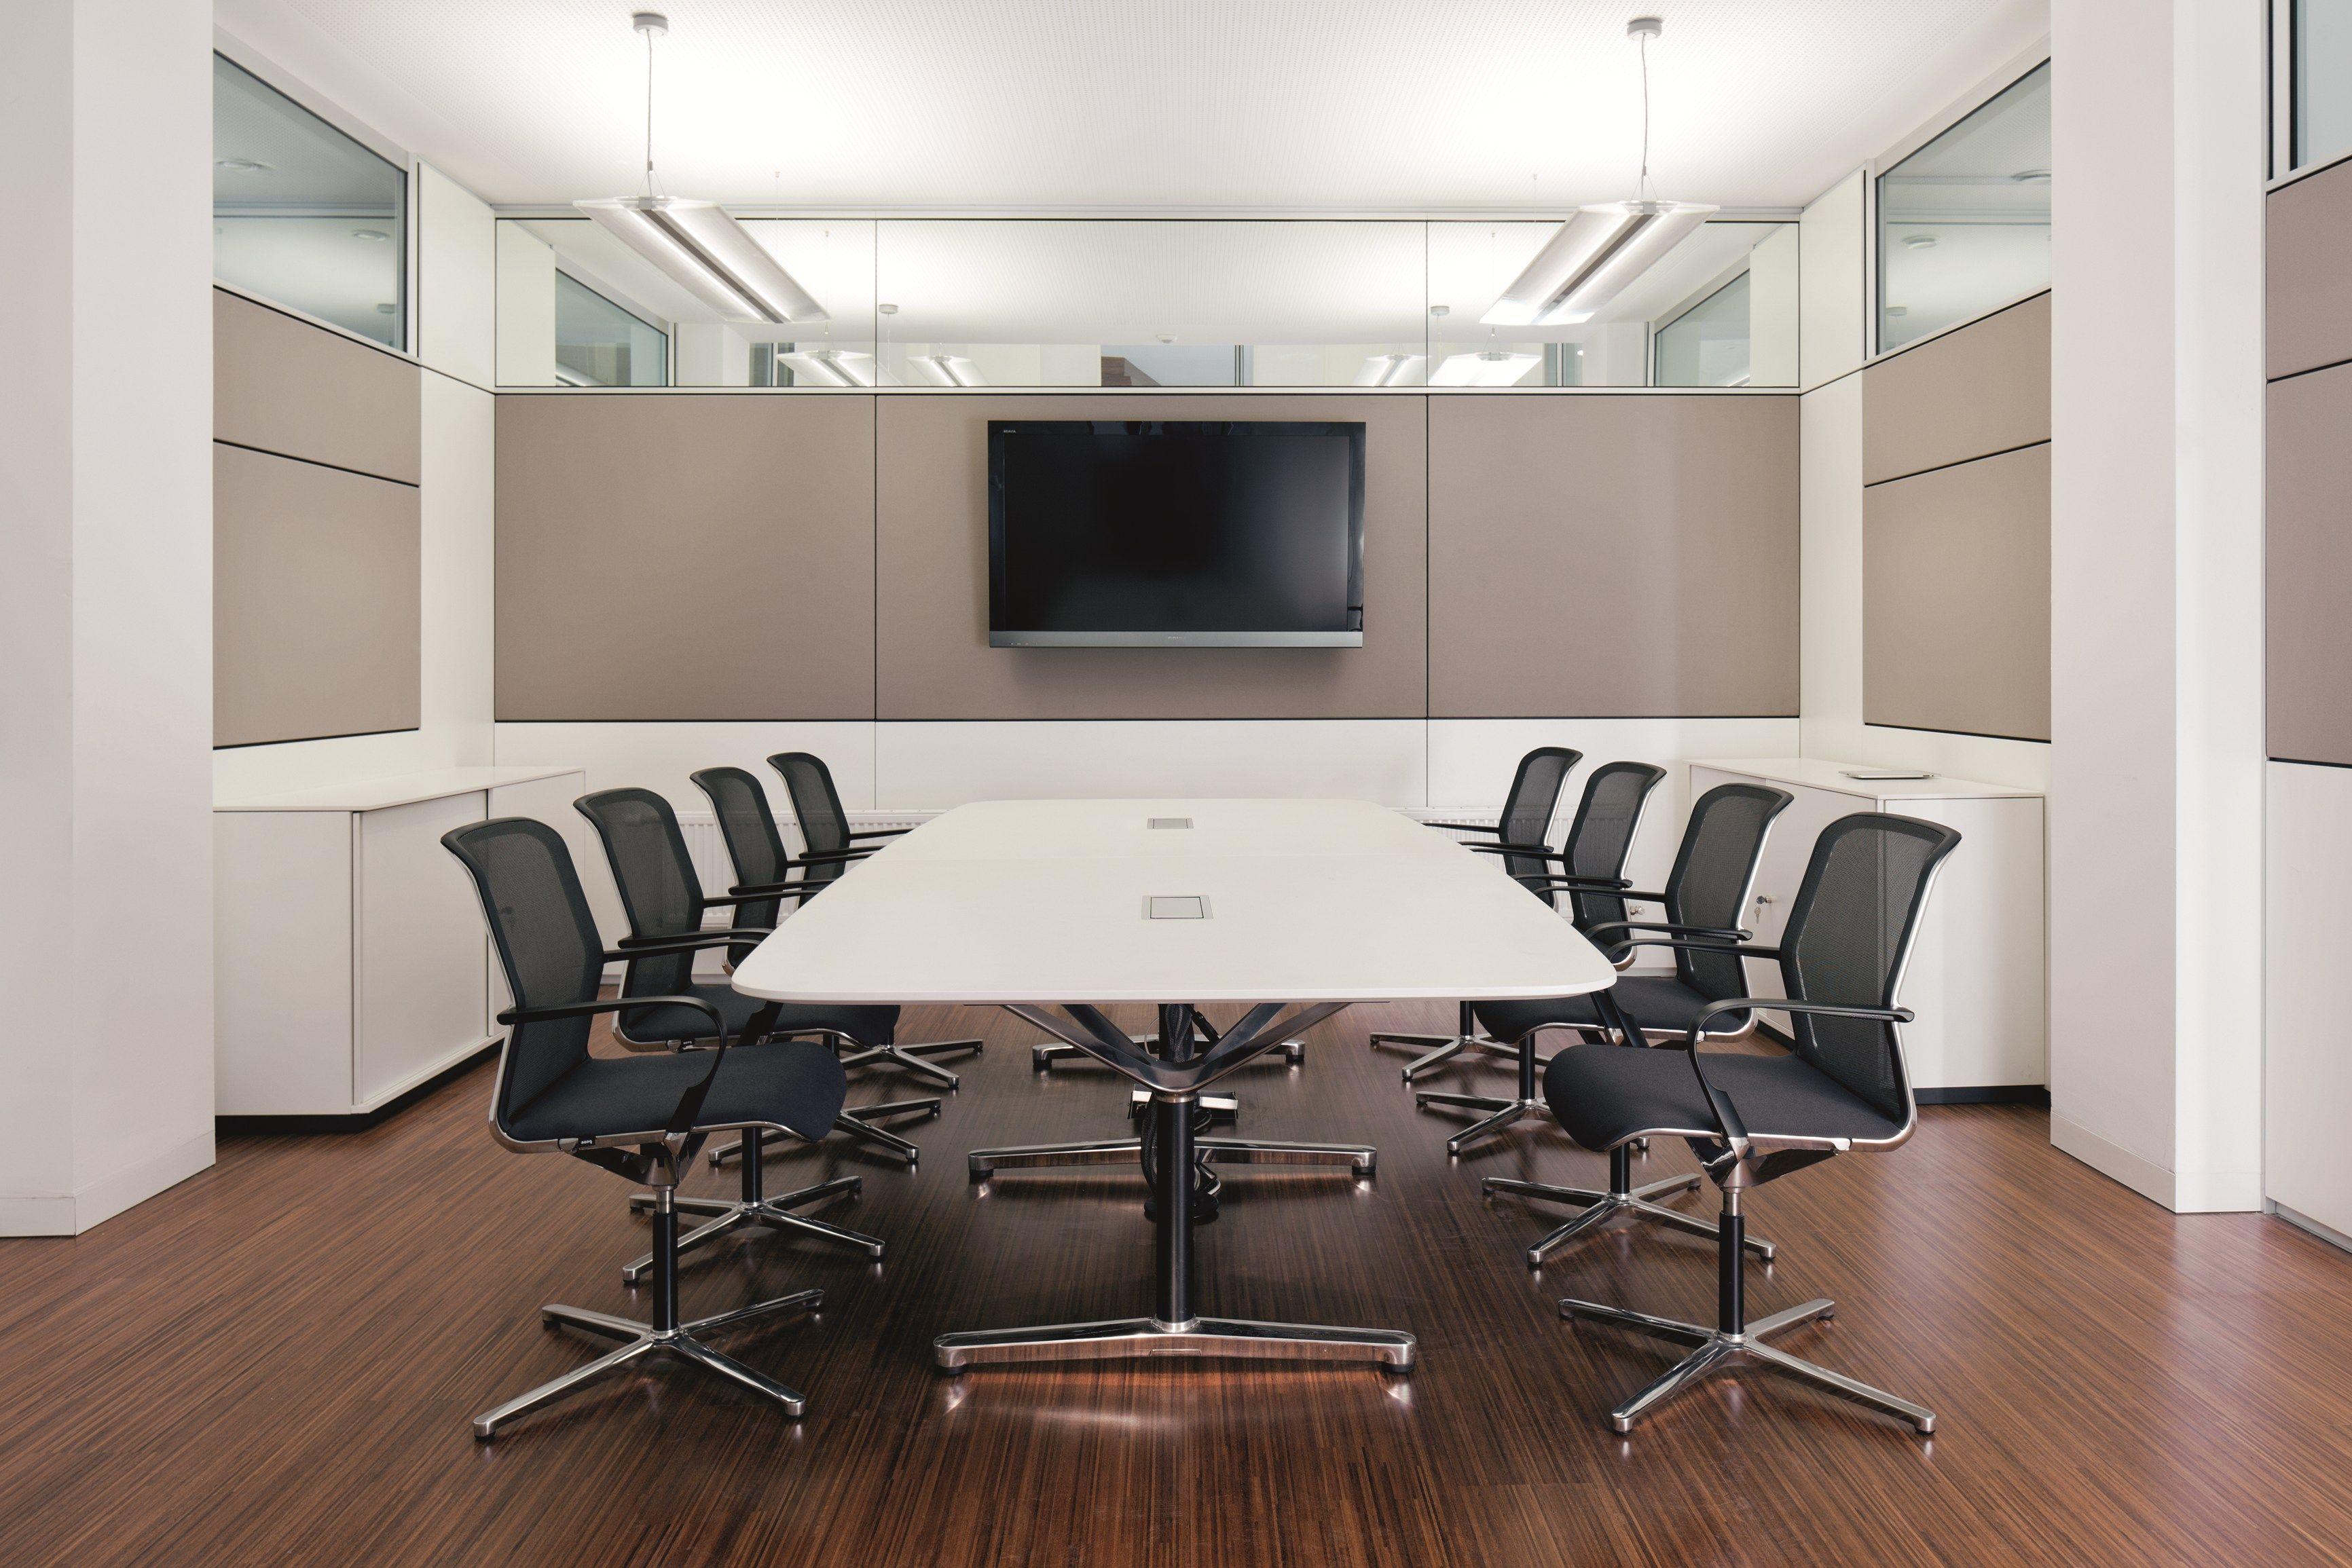 Table de r union filo conference by bene design eoos - Table de reunion design ...